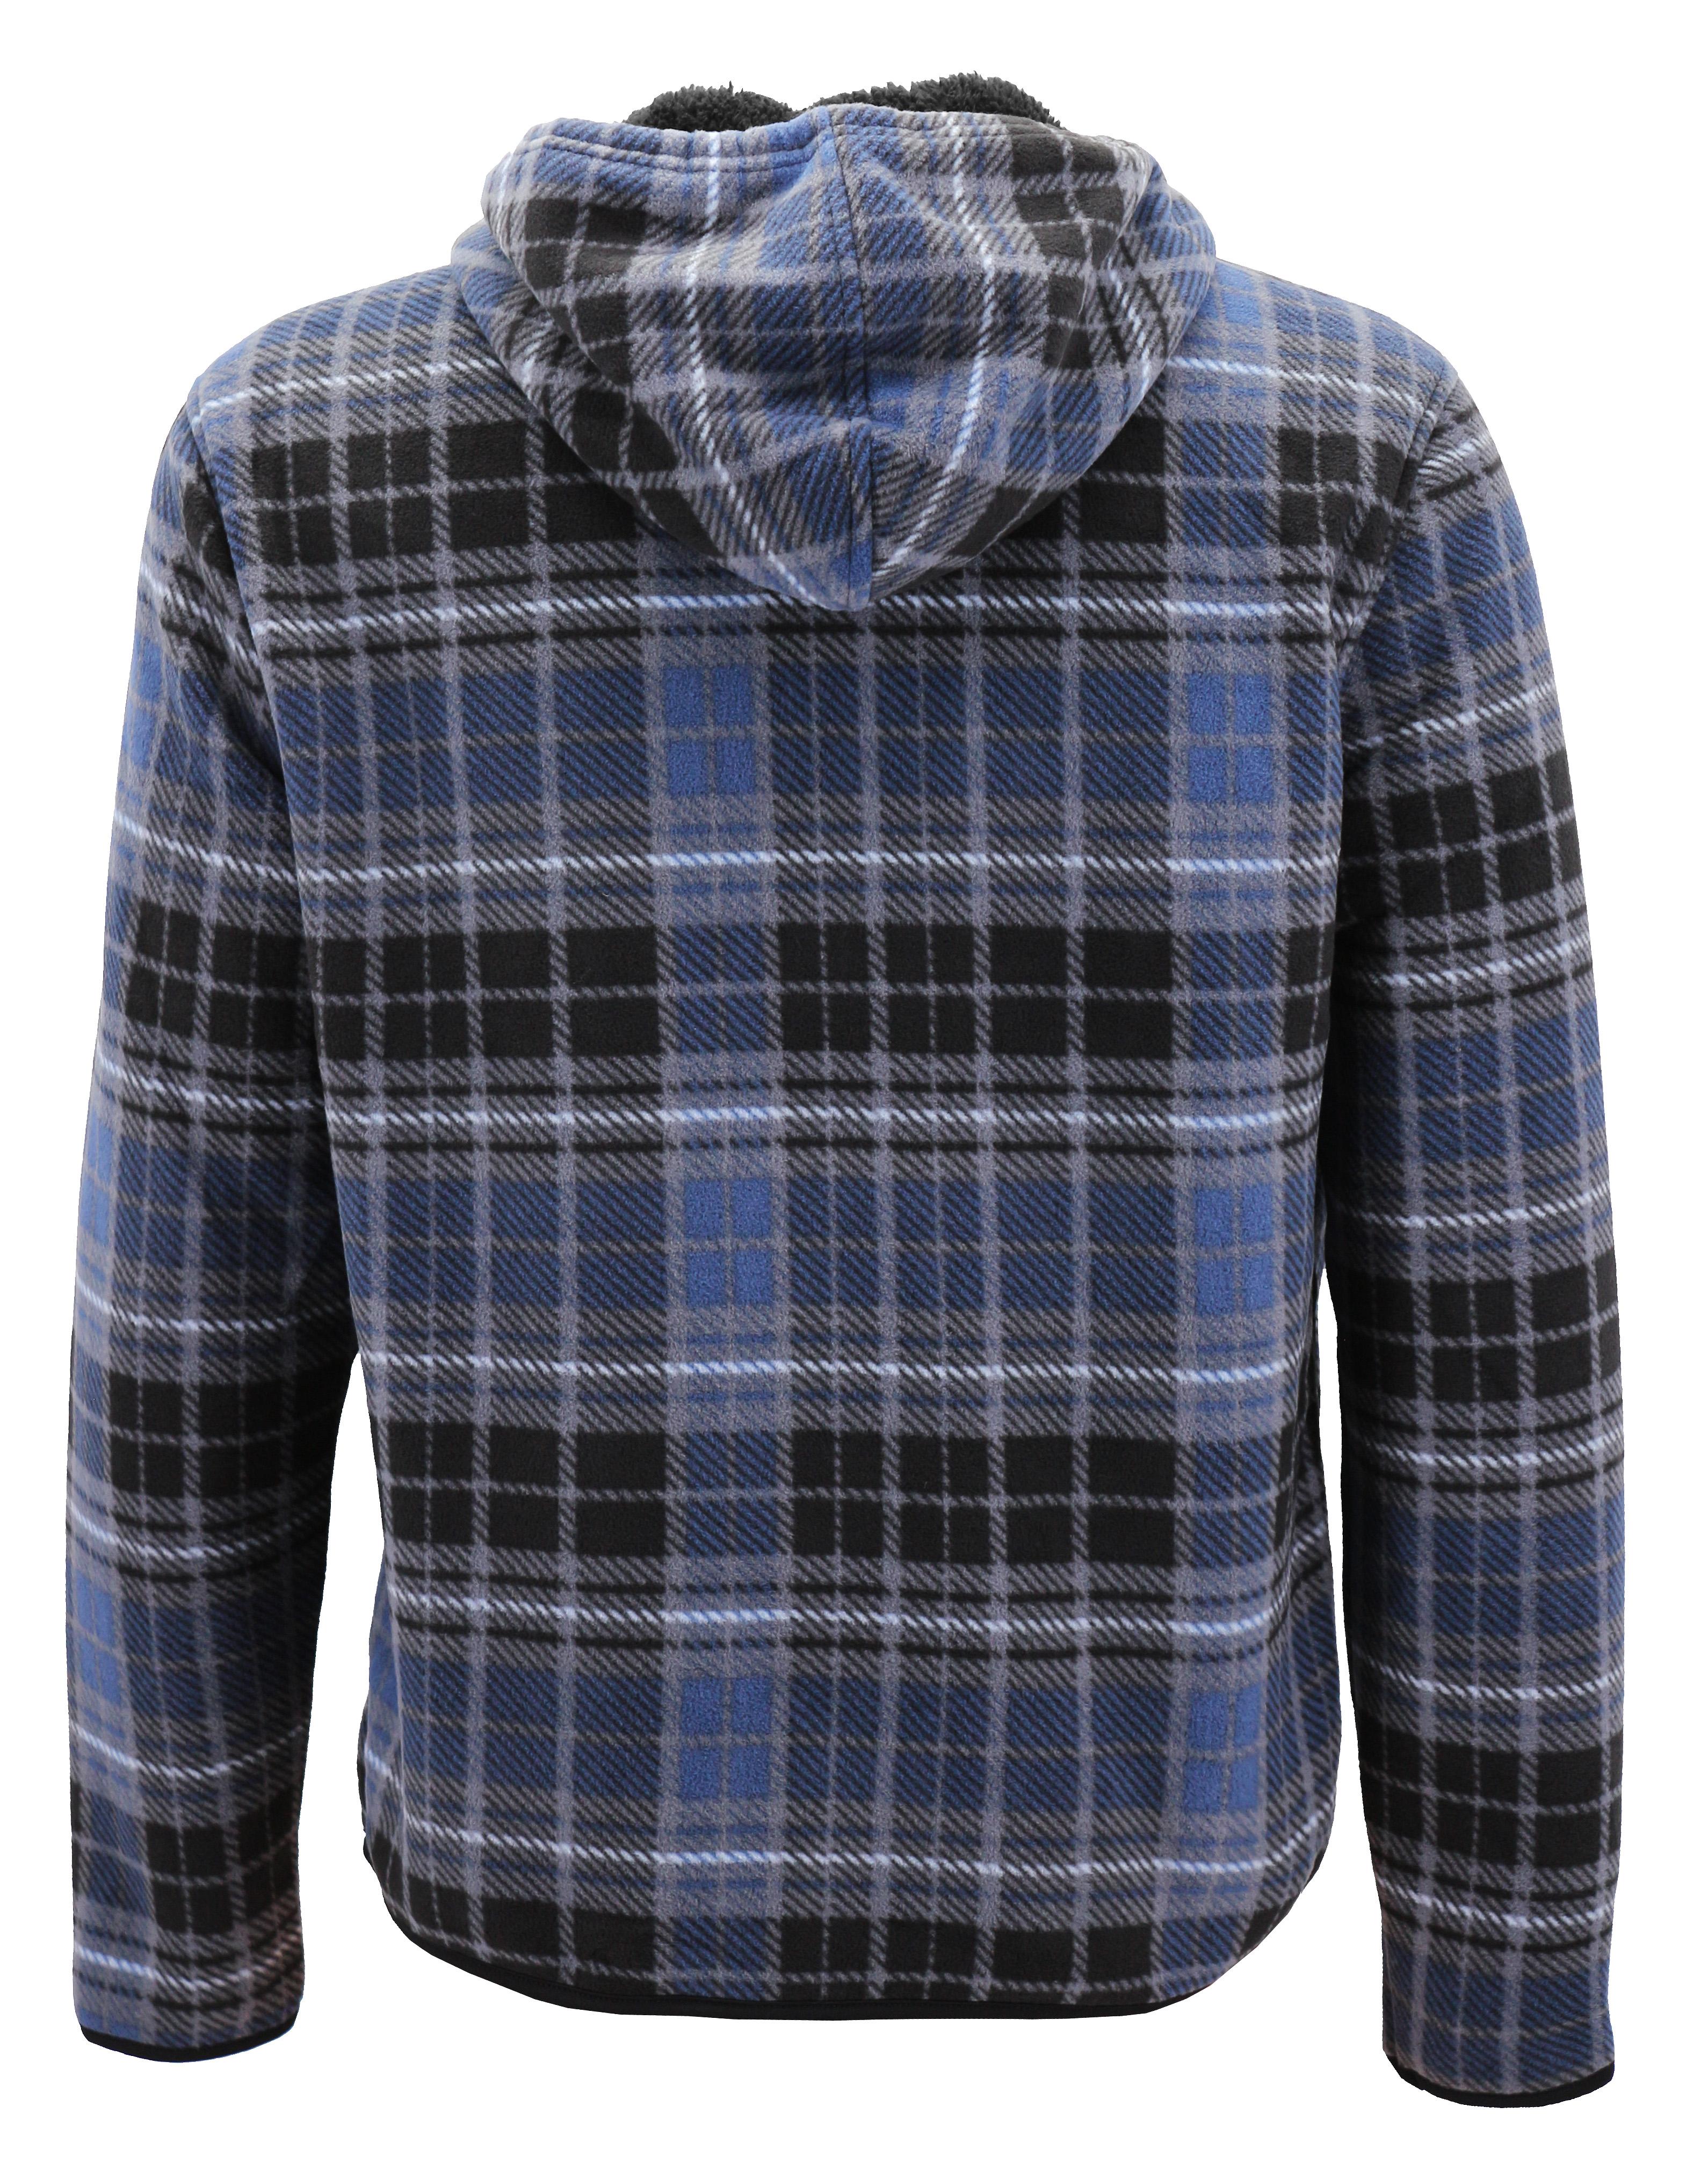 thumbnail 9 - Men-039-s-Casual-Flannel-Zip-Up-Fleece-Lined-Plaid-Sherpa-Hoodie-Lightweight-Jacket